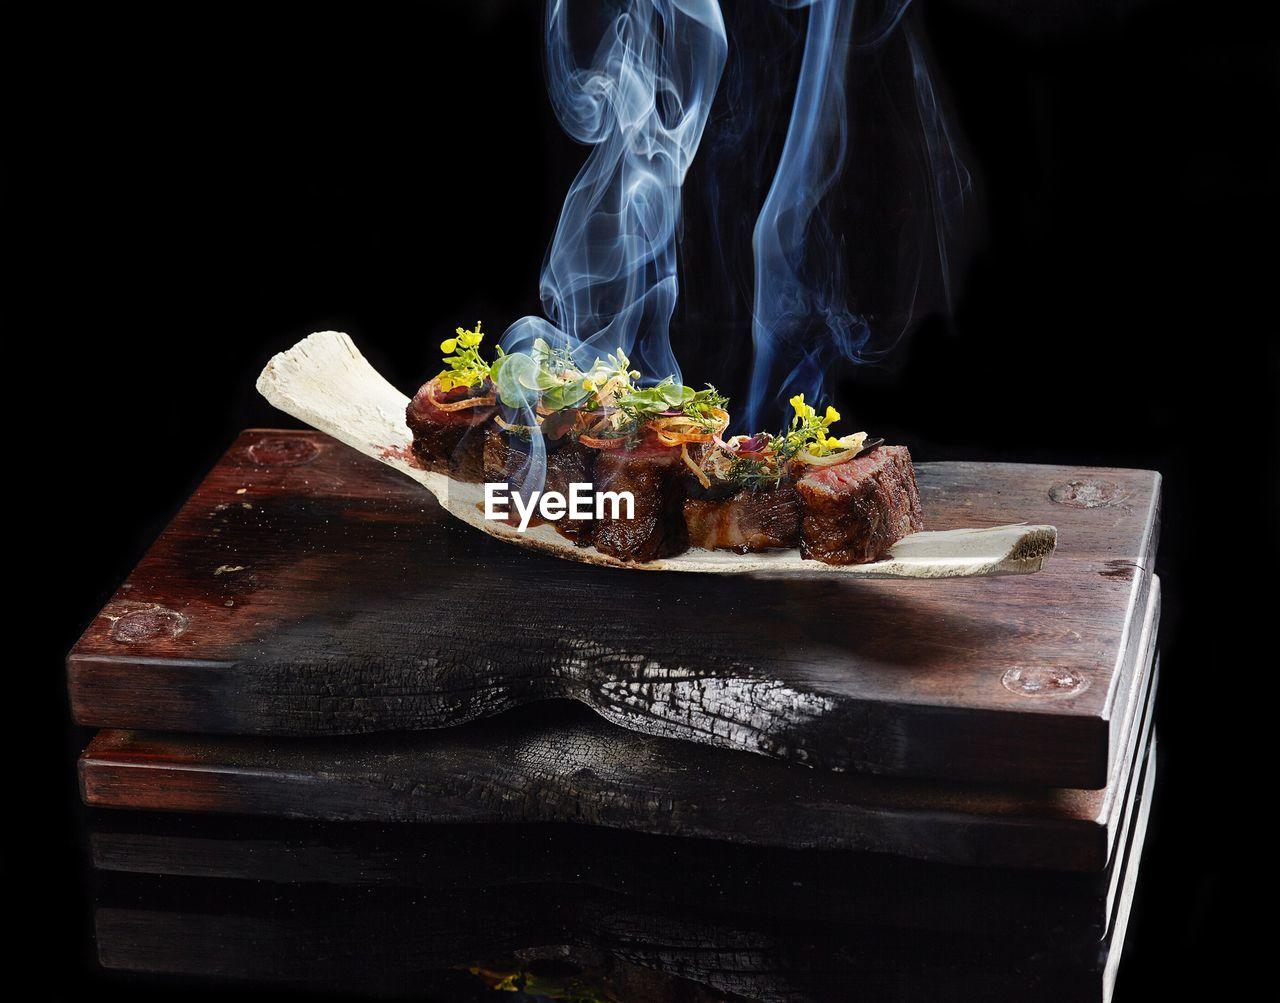 Steamed meat on wood against black background